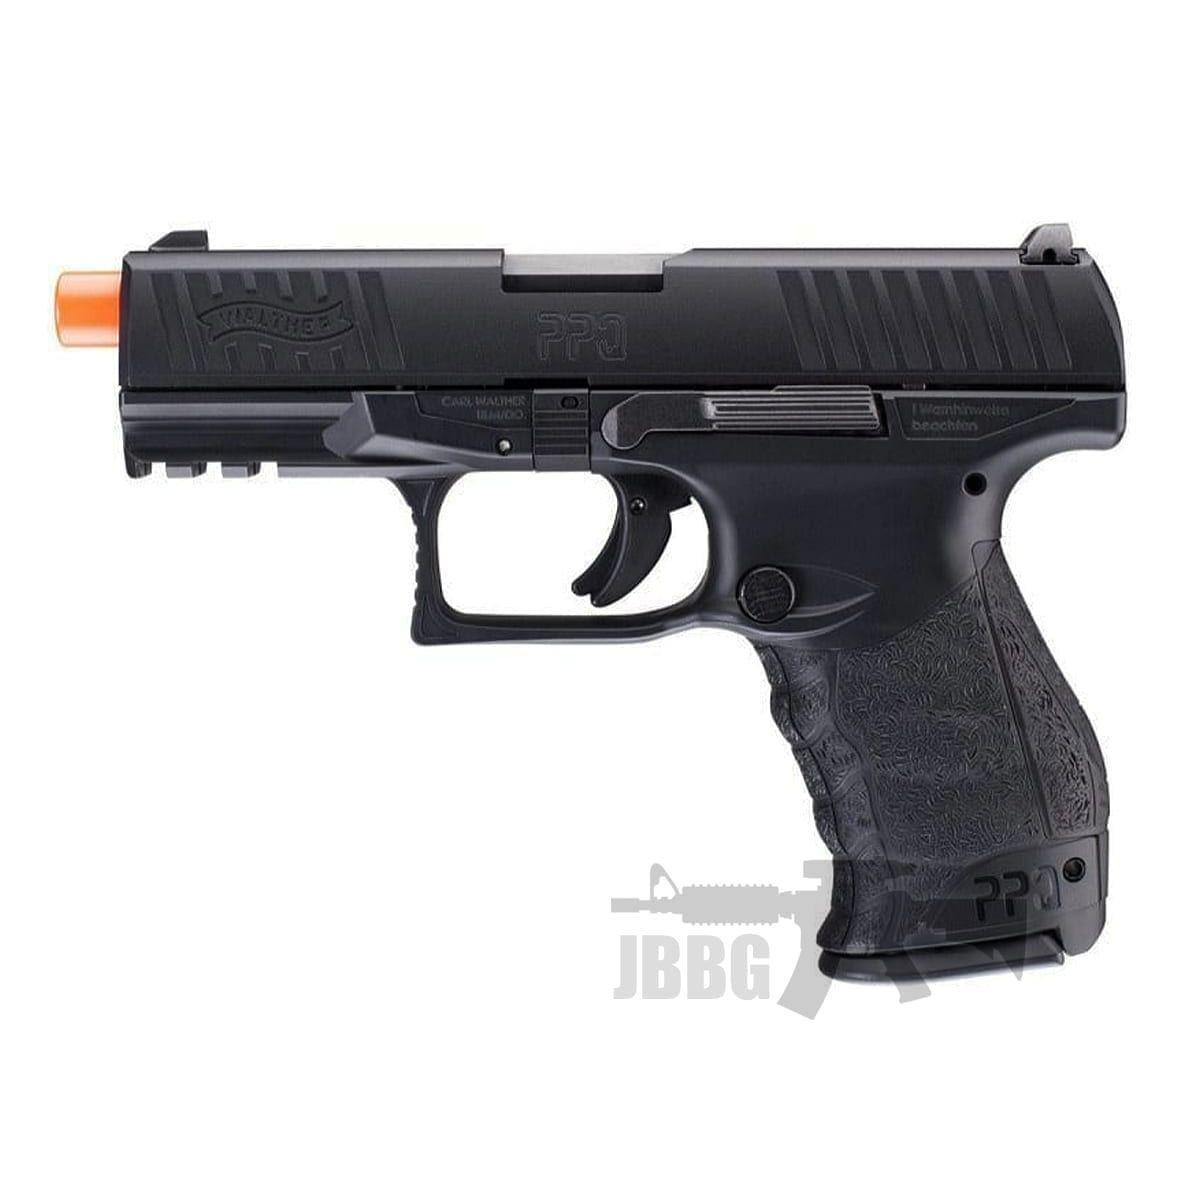 ppq airsoft pistol